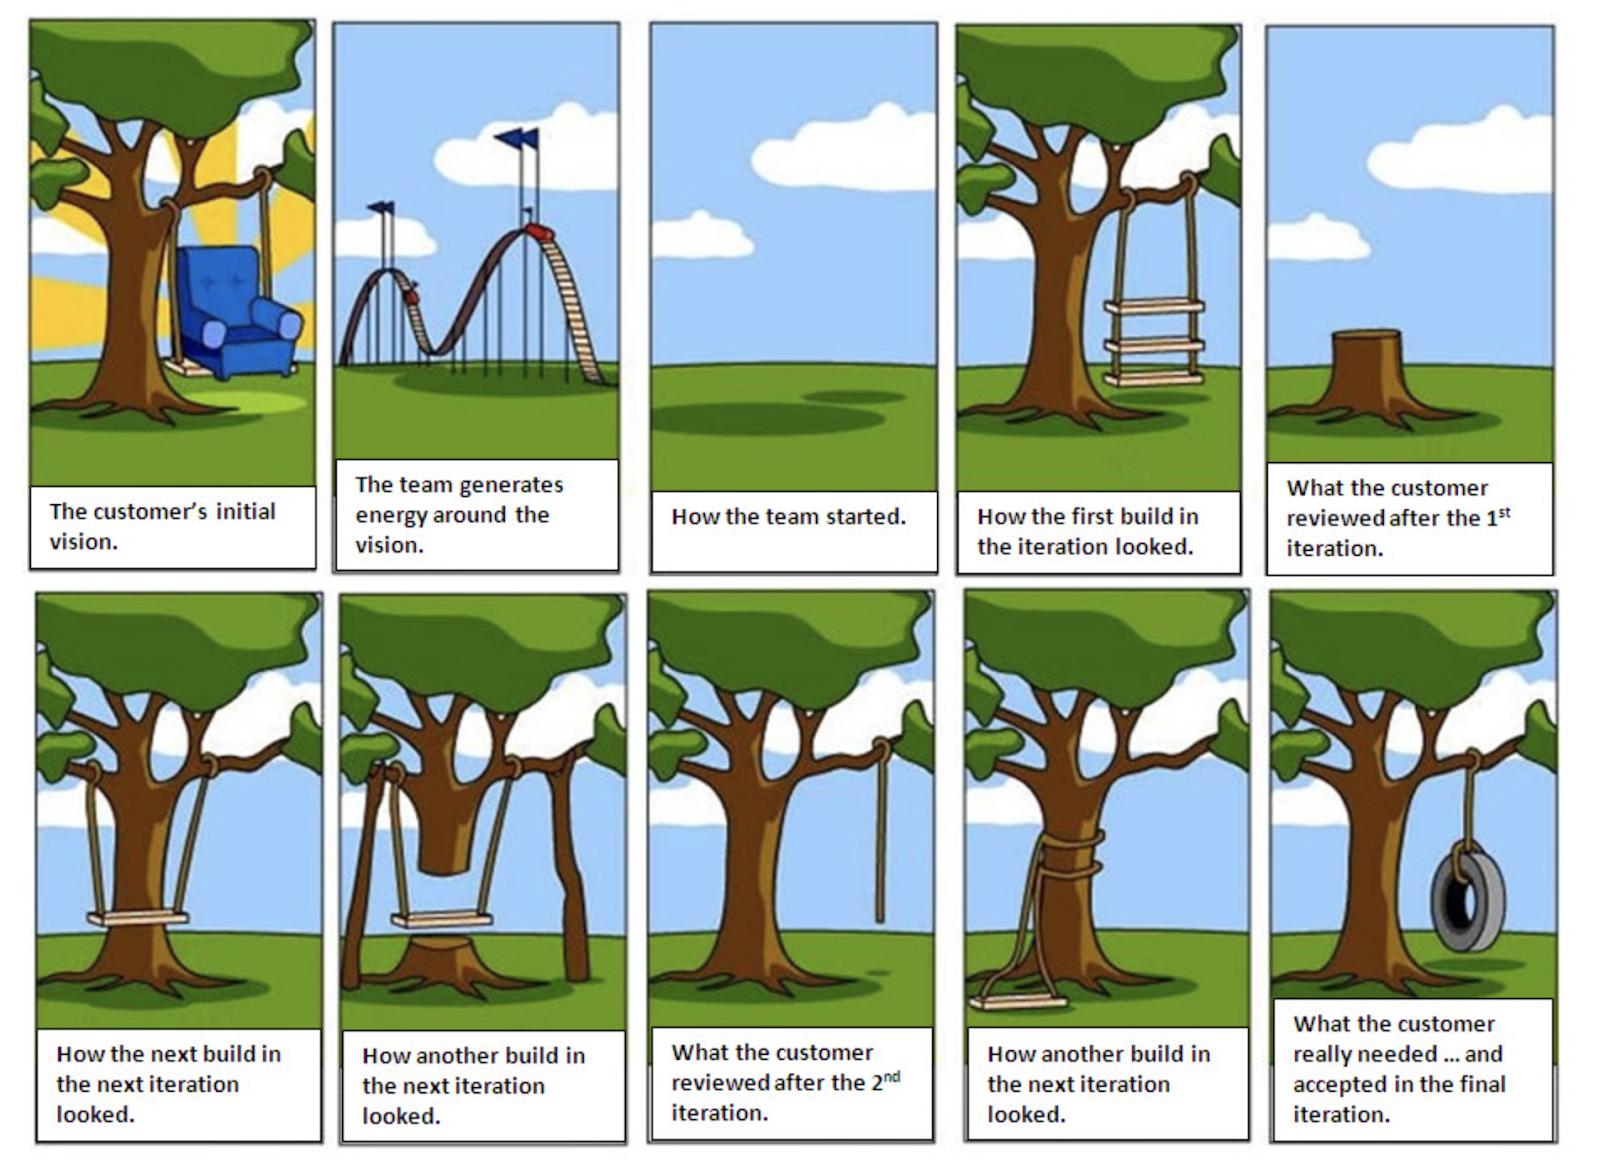 Cartoon showing user journey and customer feedback in app development works